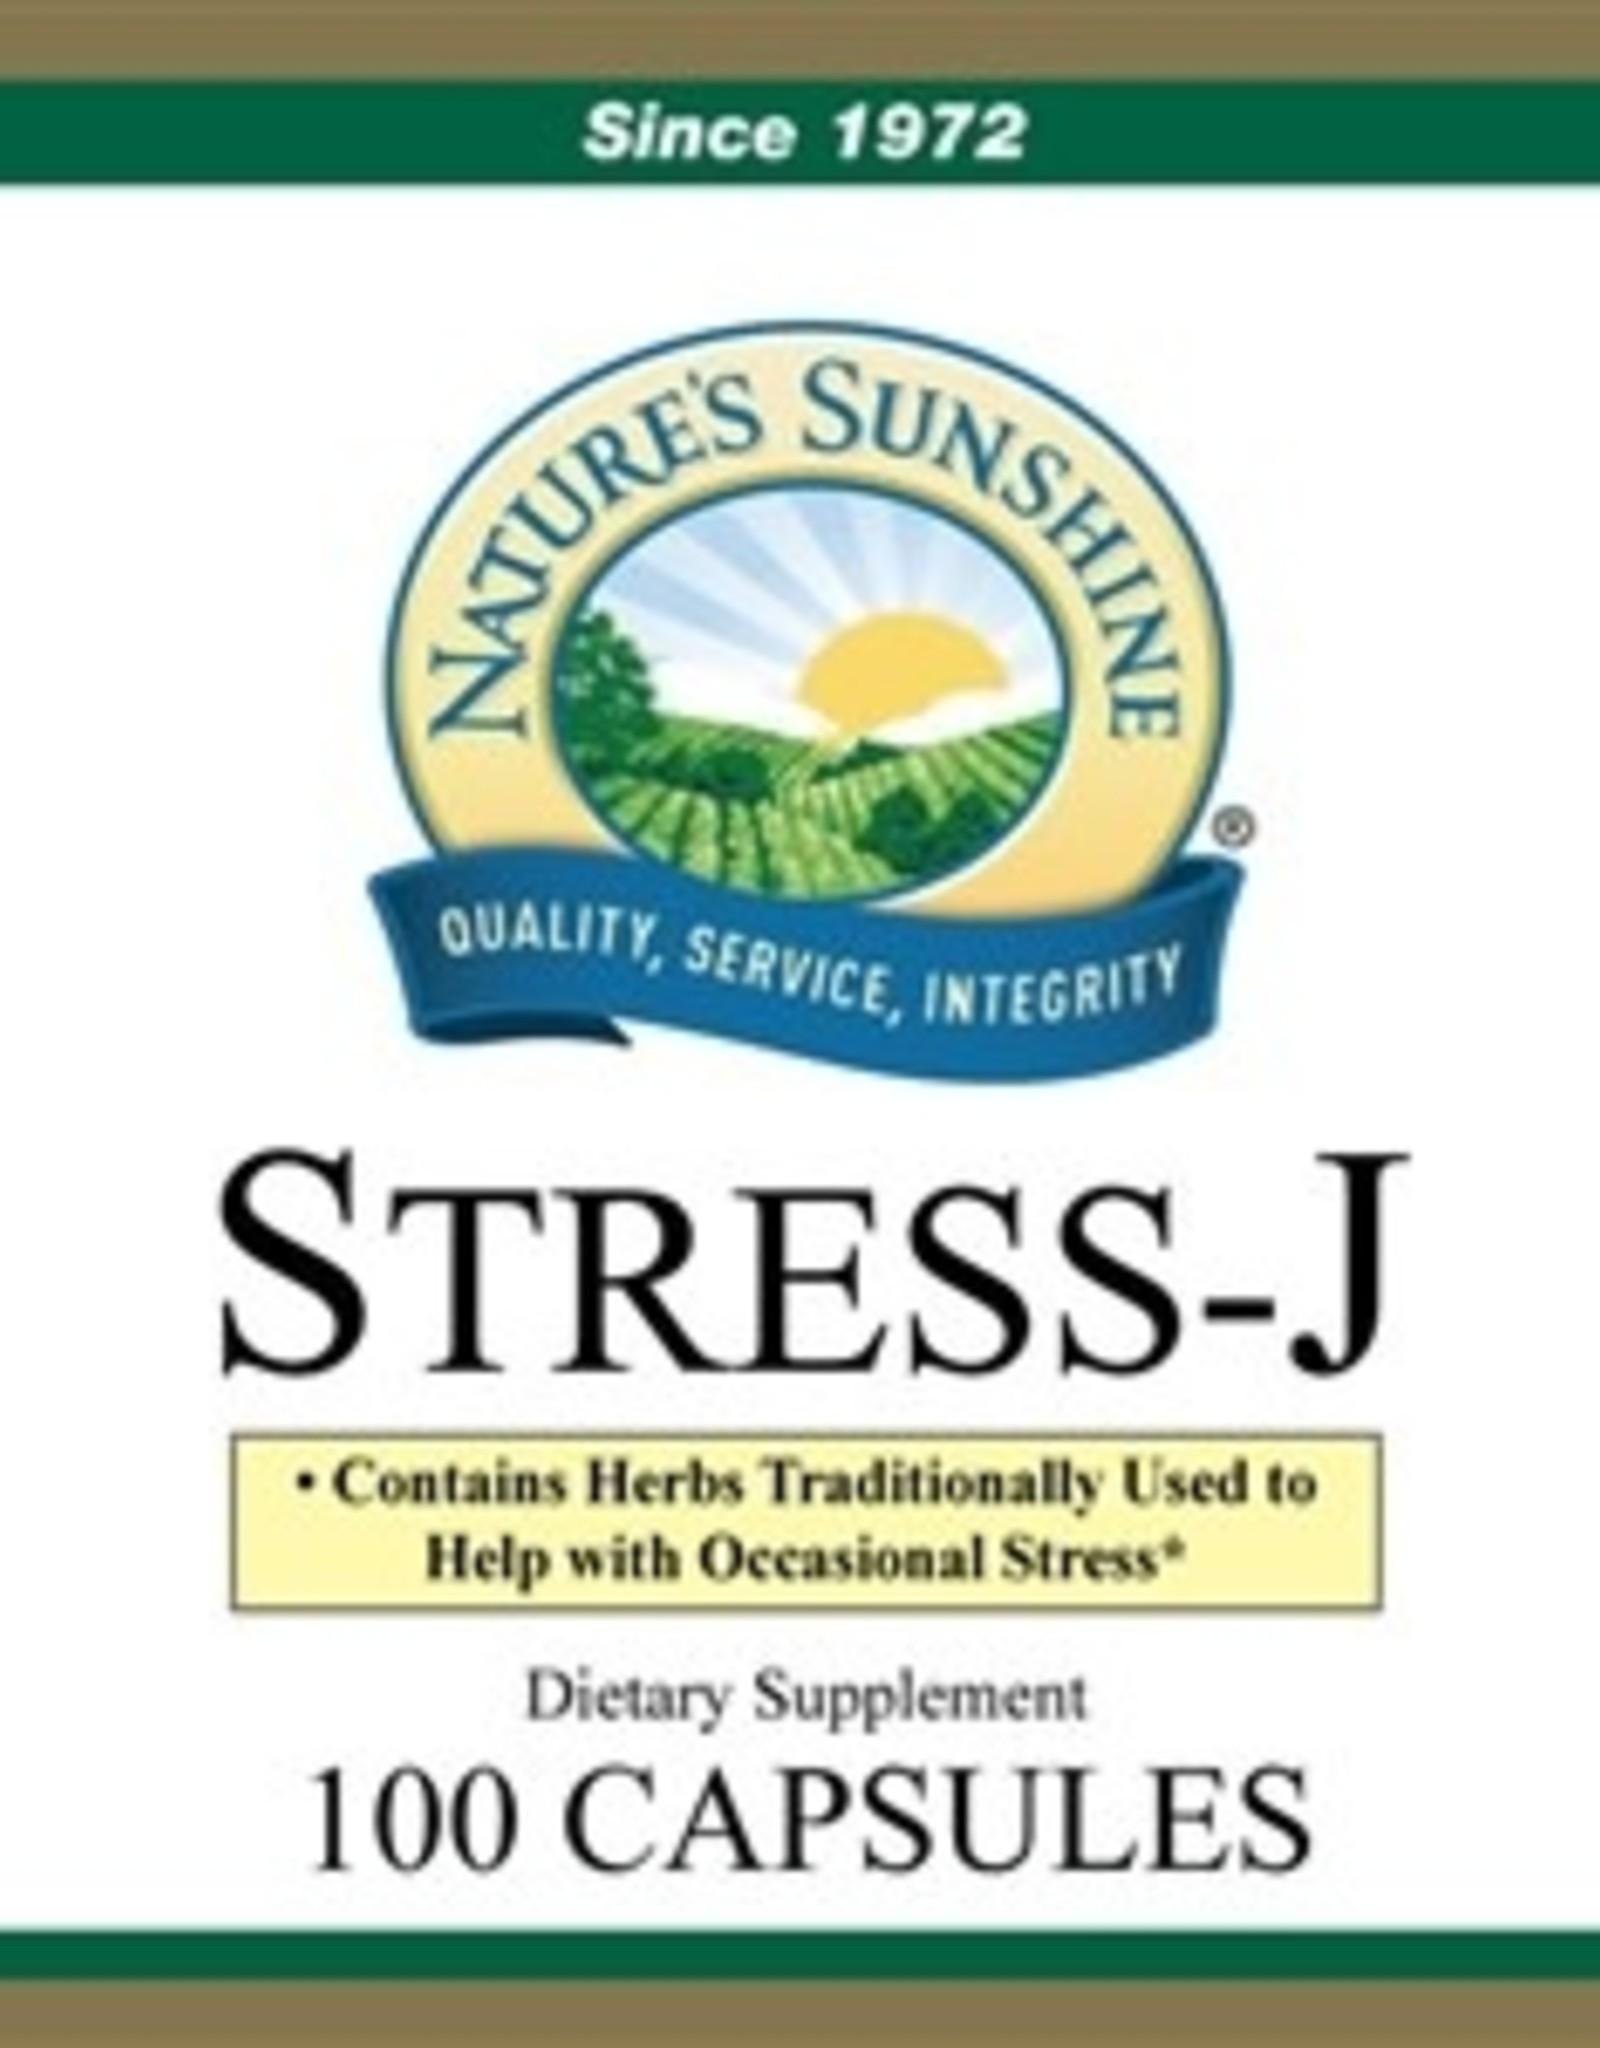 Nature's Sunshine Stress-J (100 caps)